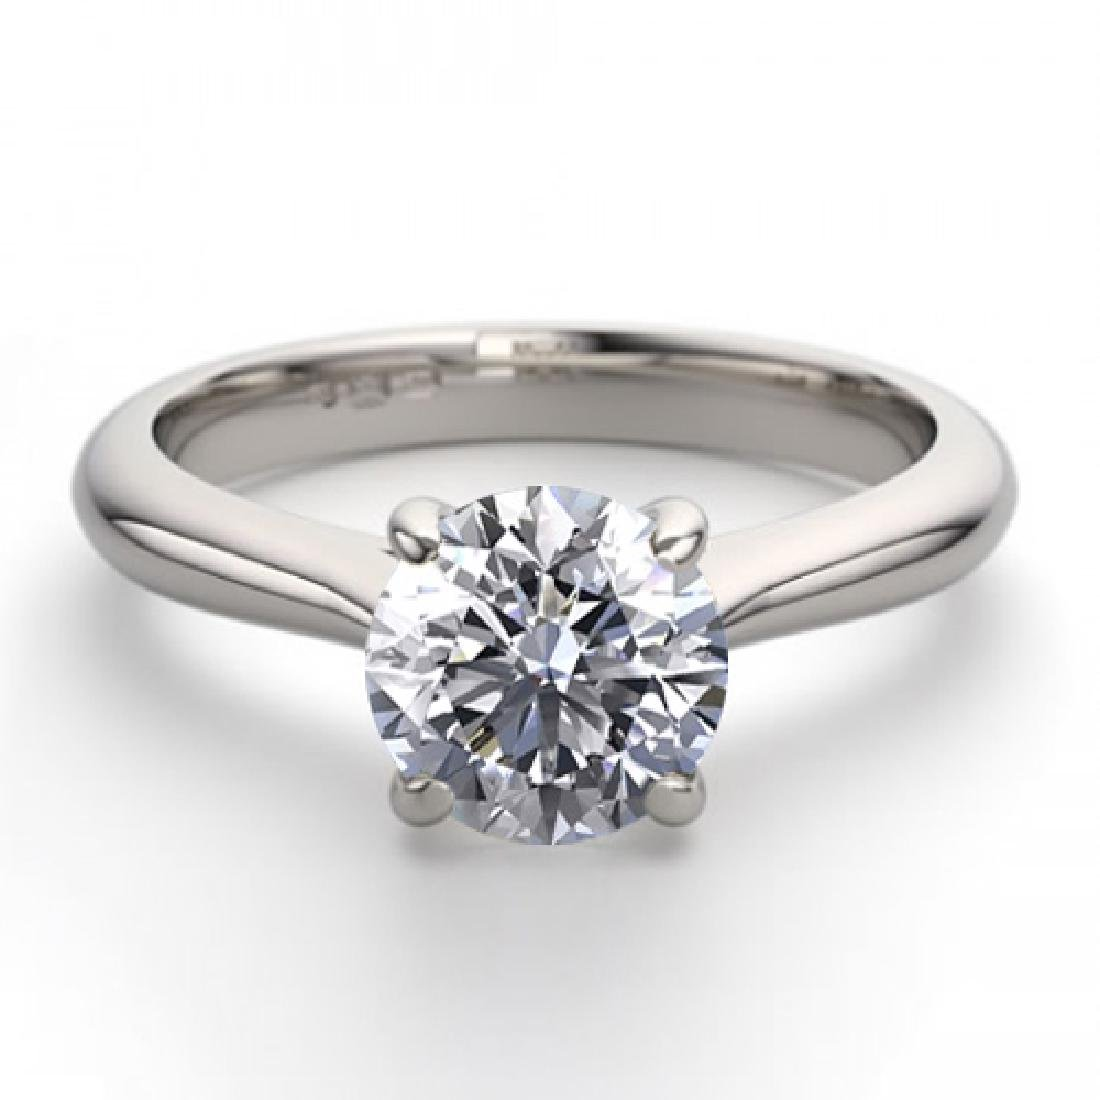 14K White Gold Jewelry 1.02 ctw Natural Diamond